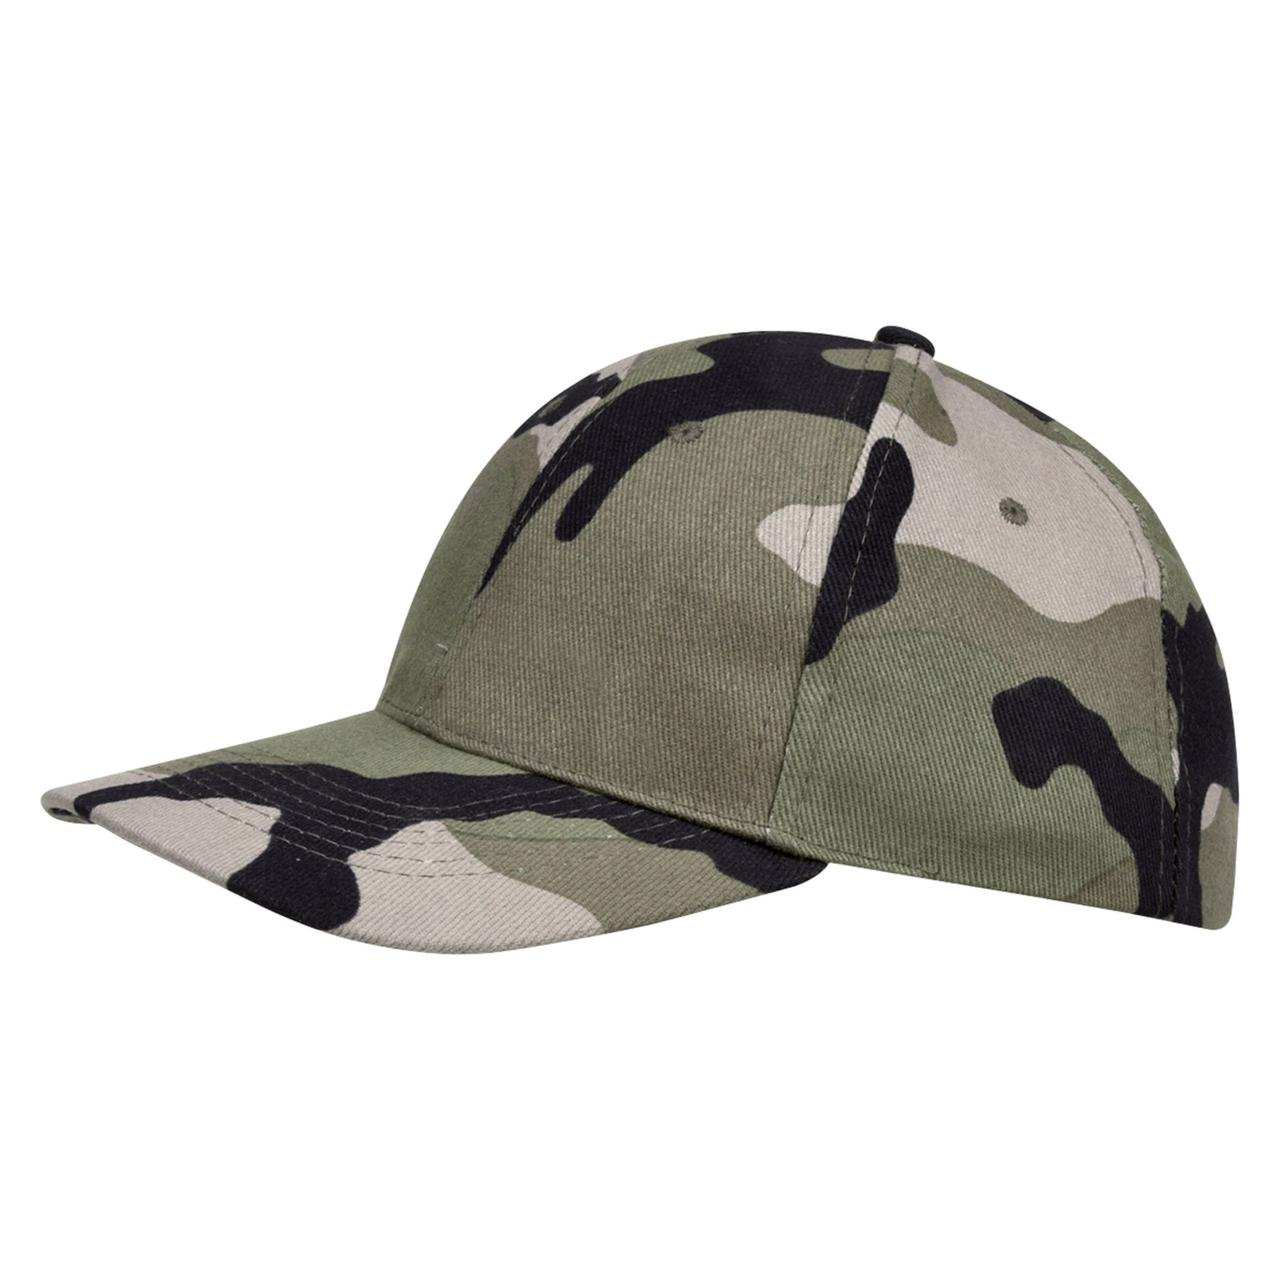 Бейсболка Buffalo зеленый камуфляж (артикул 6404.17)